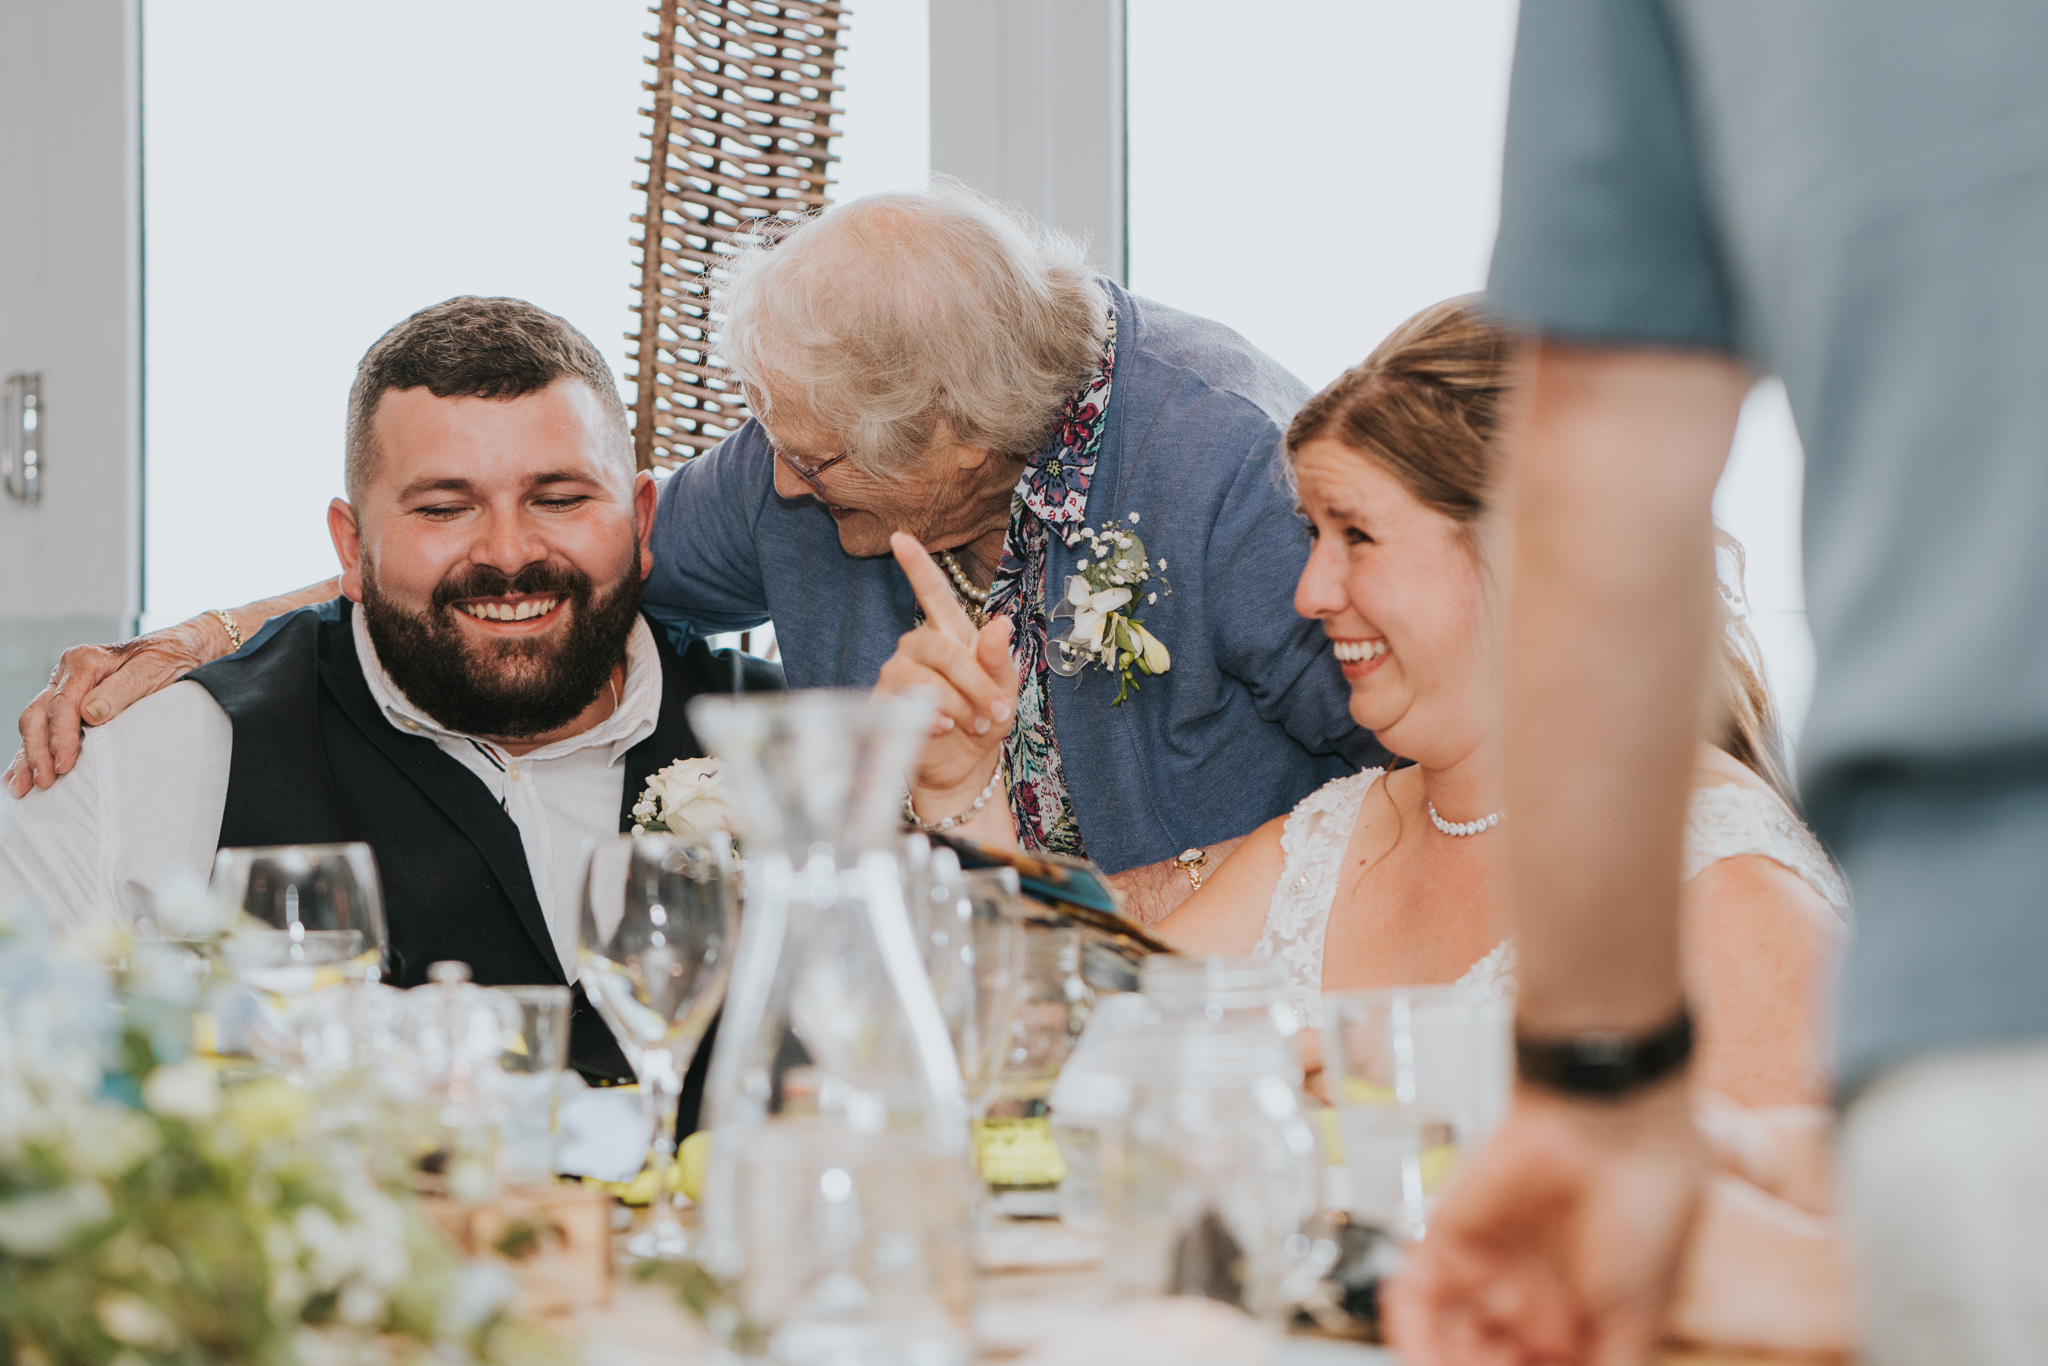 john-amy-relaxed-beach-wedding-tunnels-beaches-ilfracombe-north-devon-grace-elizabeth-colchester-essex-alternative-relaxed-wedding-photography-devon-suffolk-norfolk-essex (123 of 159).jpg